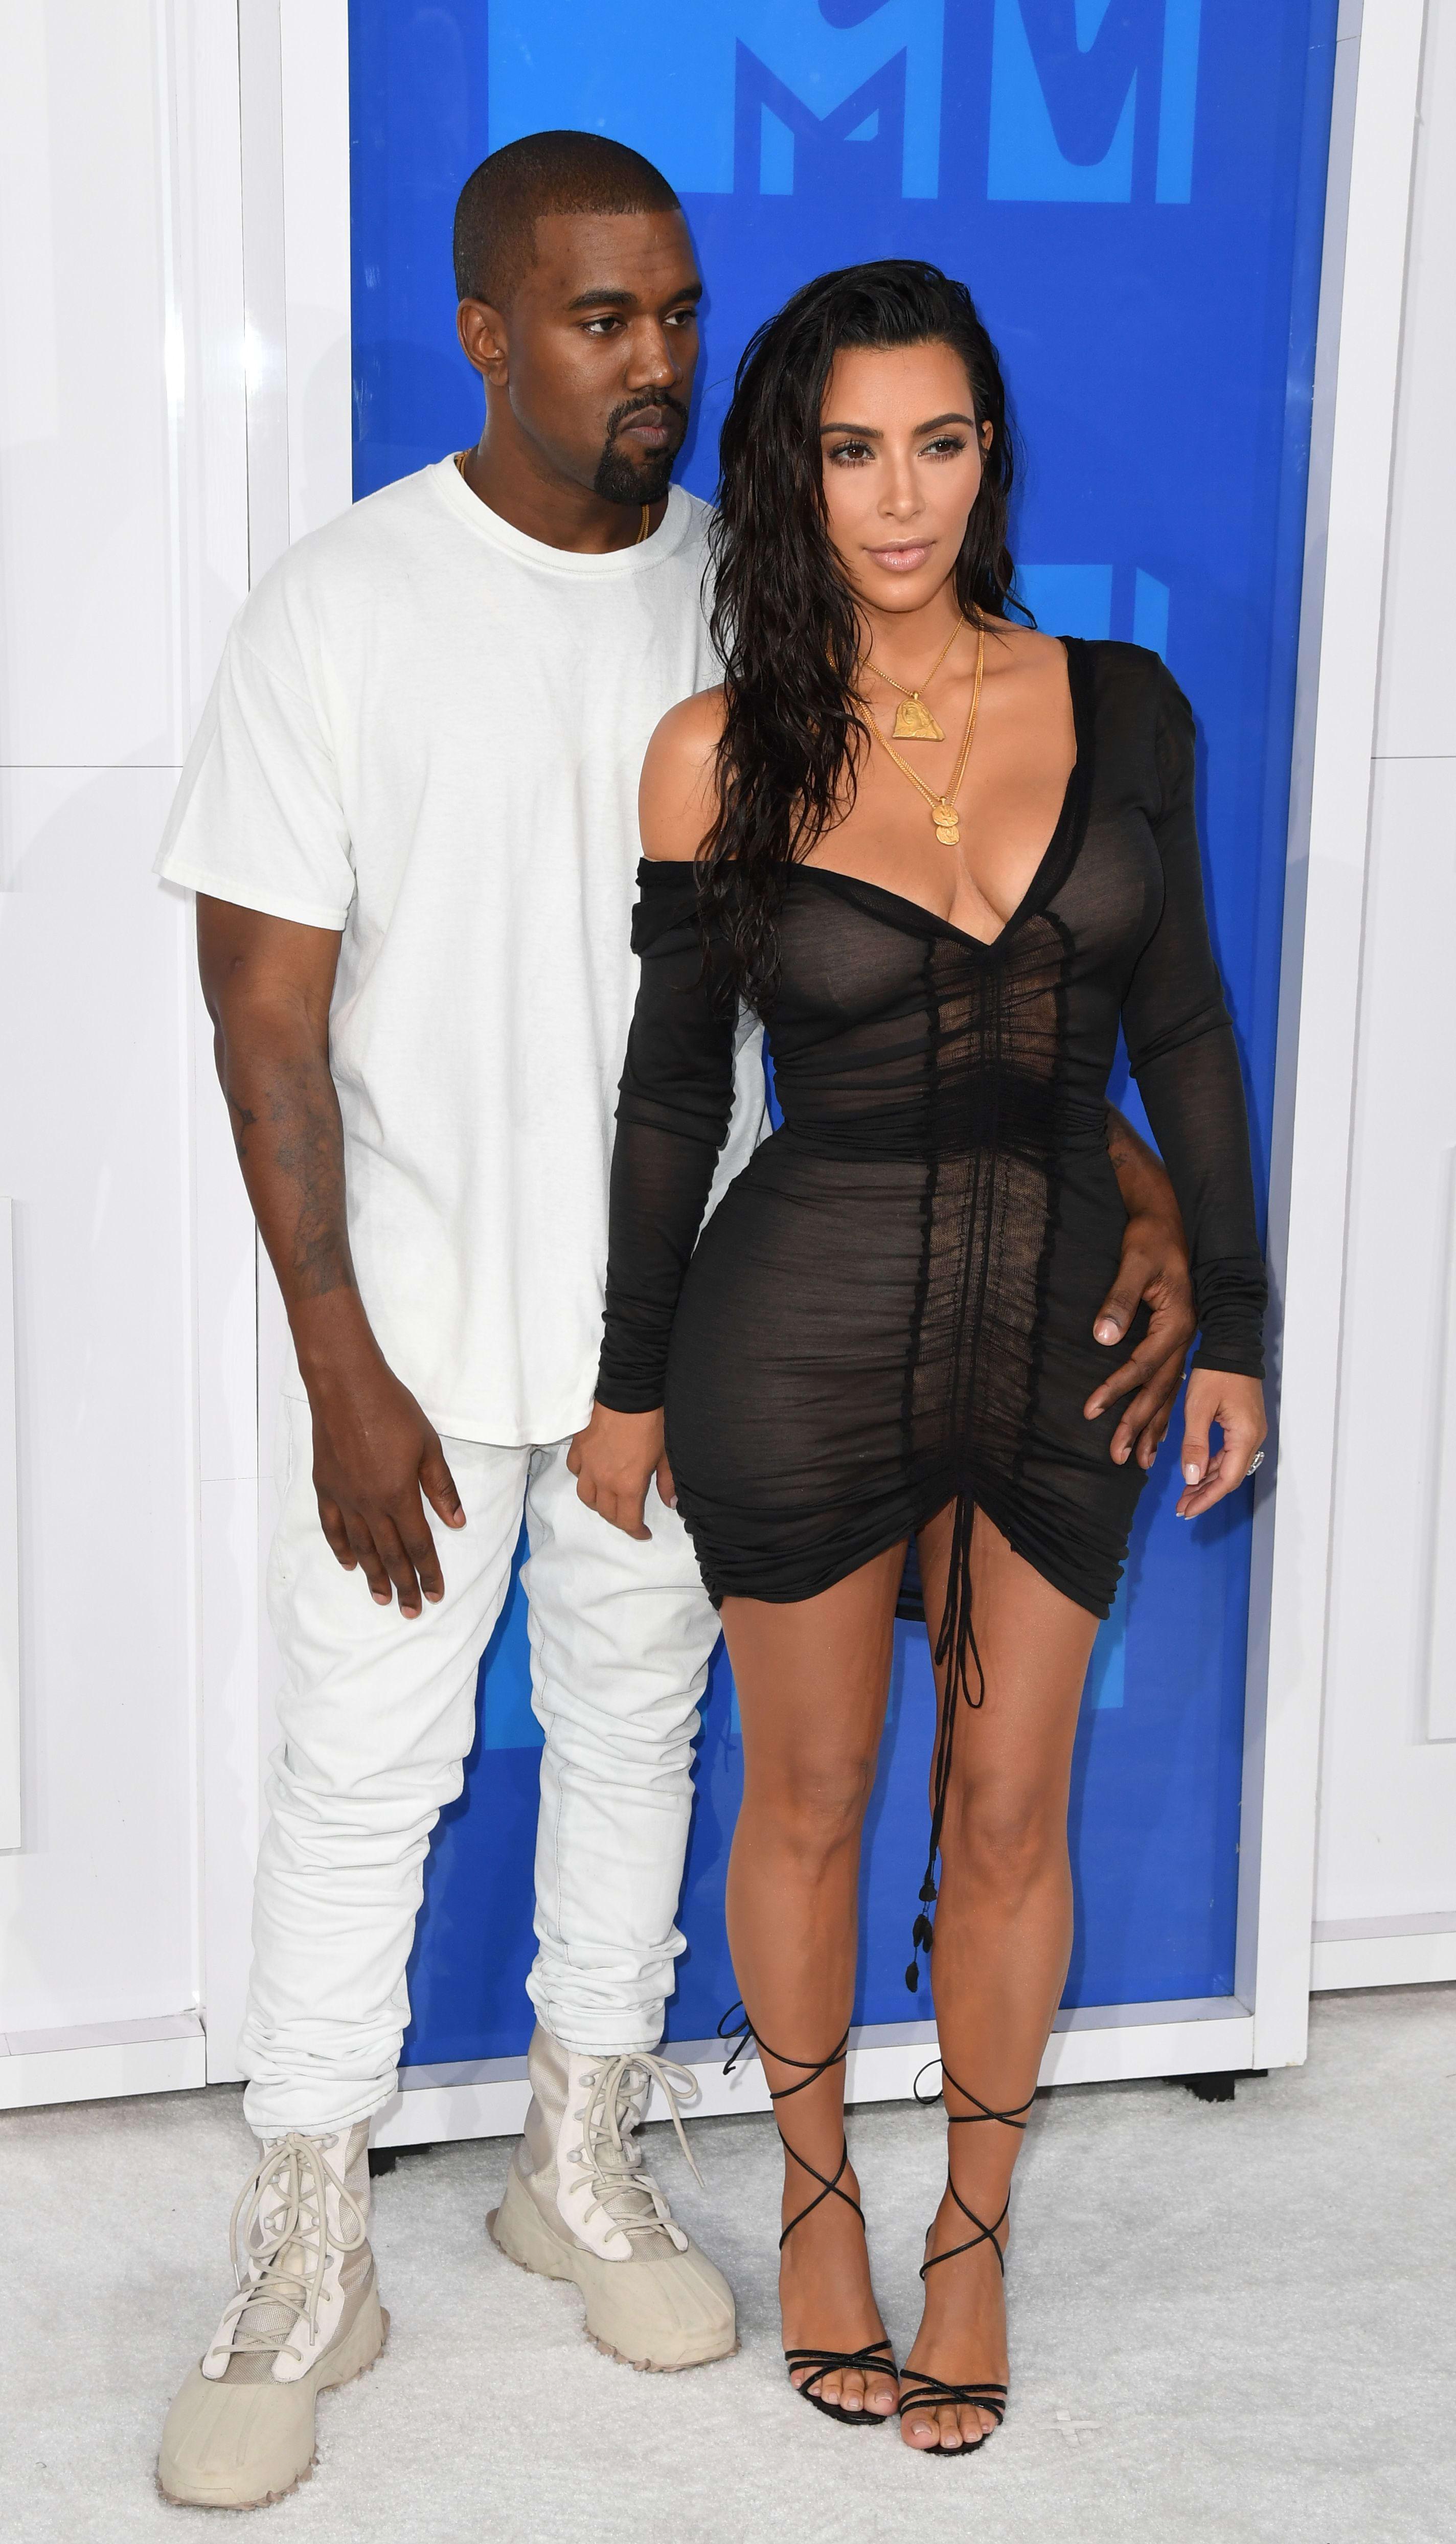 ¿Cuánto mide Kim Kardashian? - Altura - Real height Kanye-west-and-kim-kardashian-in-happier-times